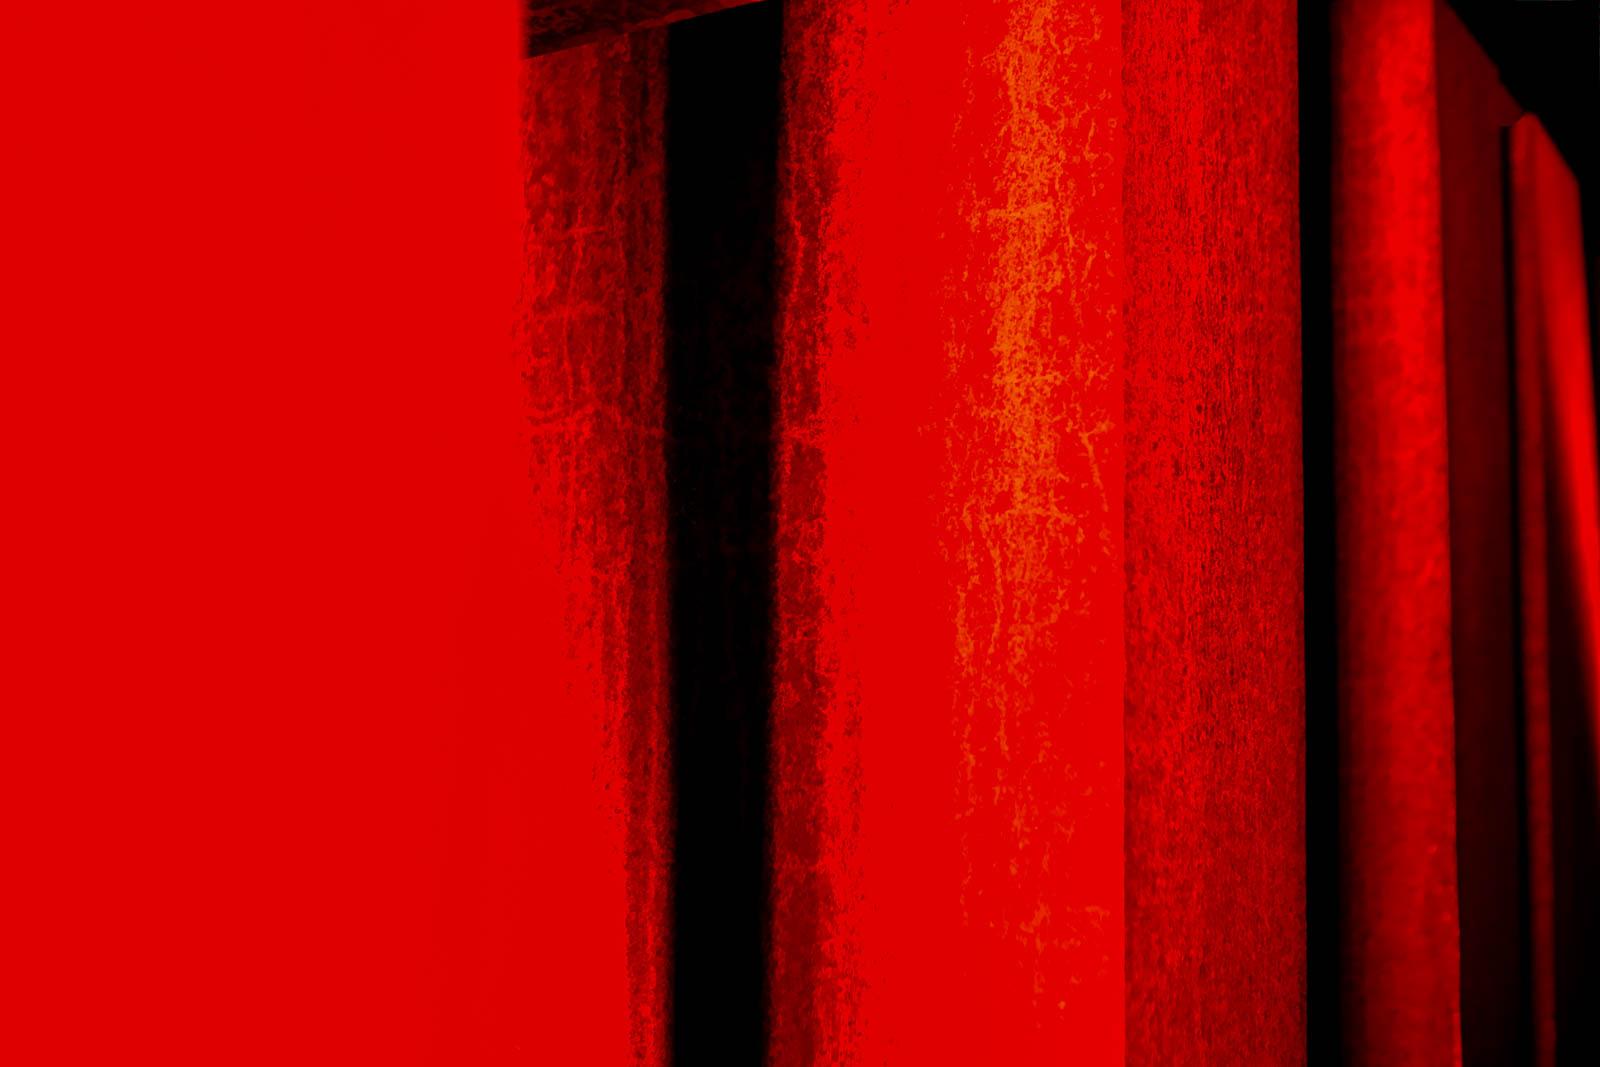 tollwood-39.jpg